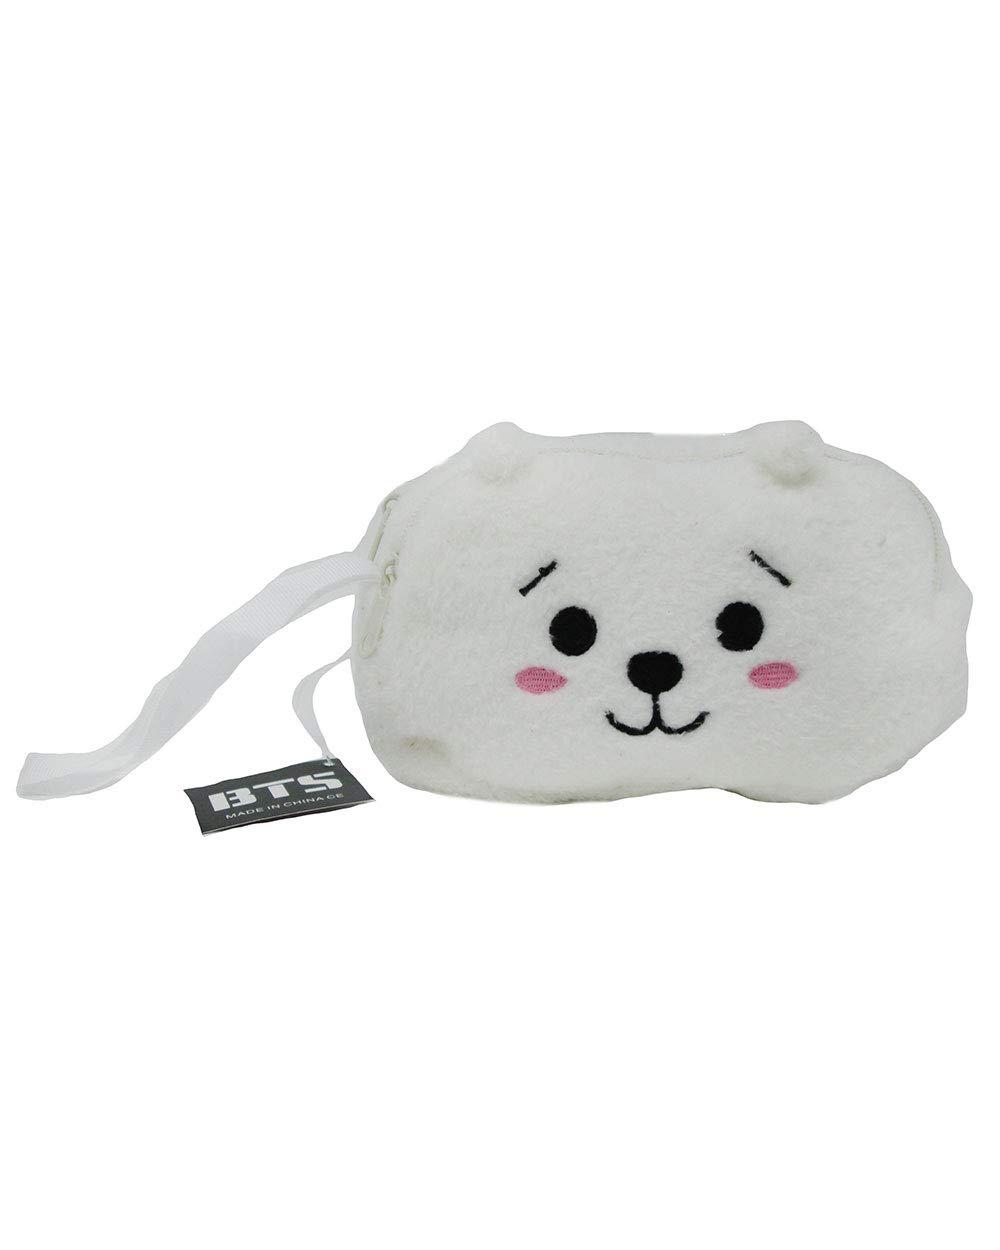 3f0518b9ae80 Amazon.com : BTS Bangtan Boys BT21 Cosmetic Bag Travel Pouch for ...